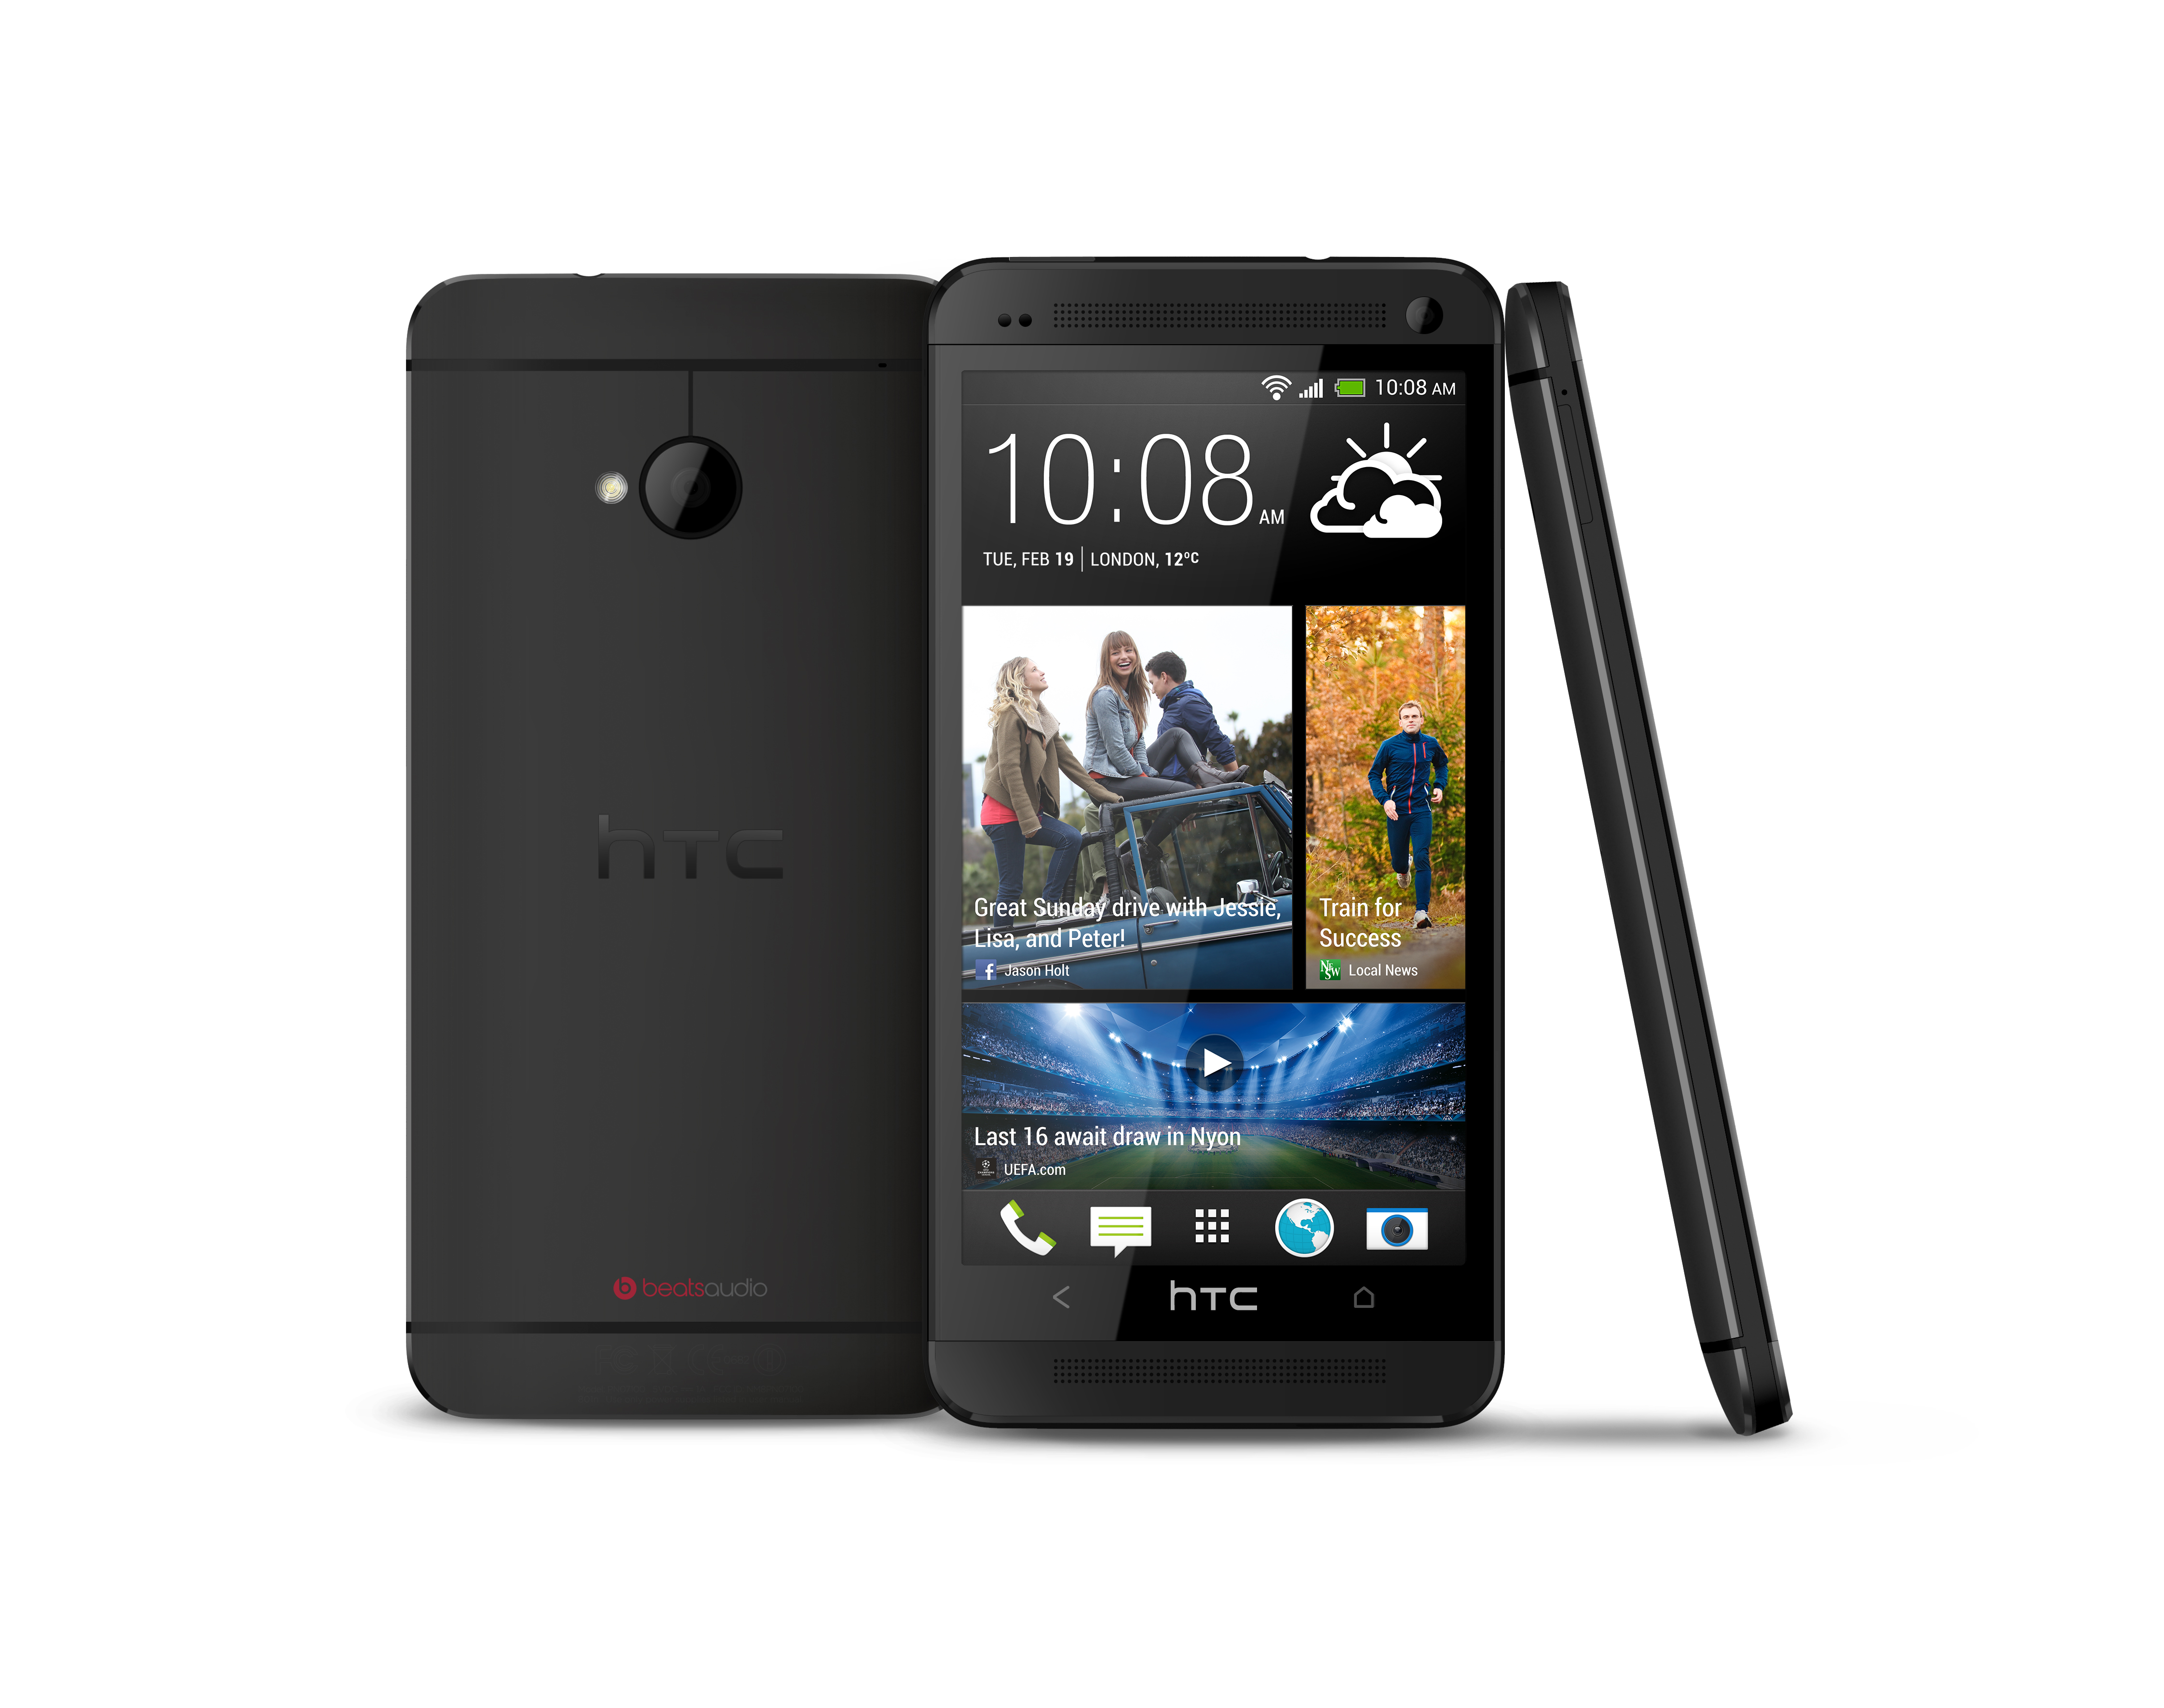 htc one m8 sim karte HTC One (M8): SIM Karte einlegen